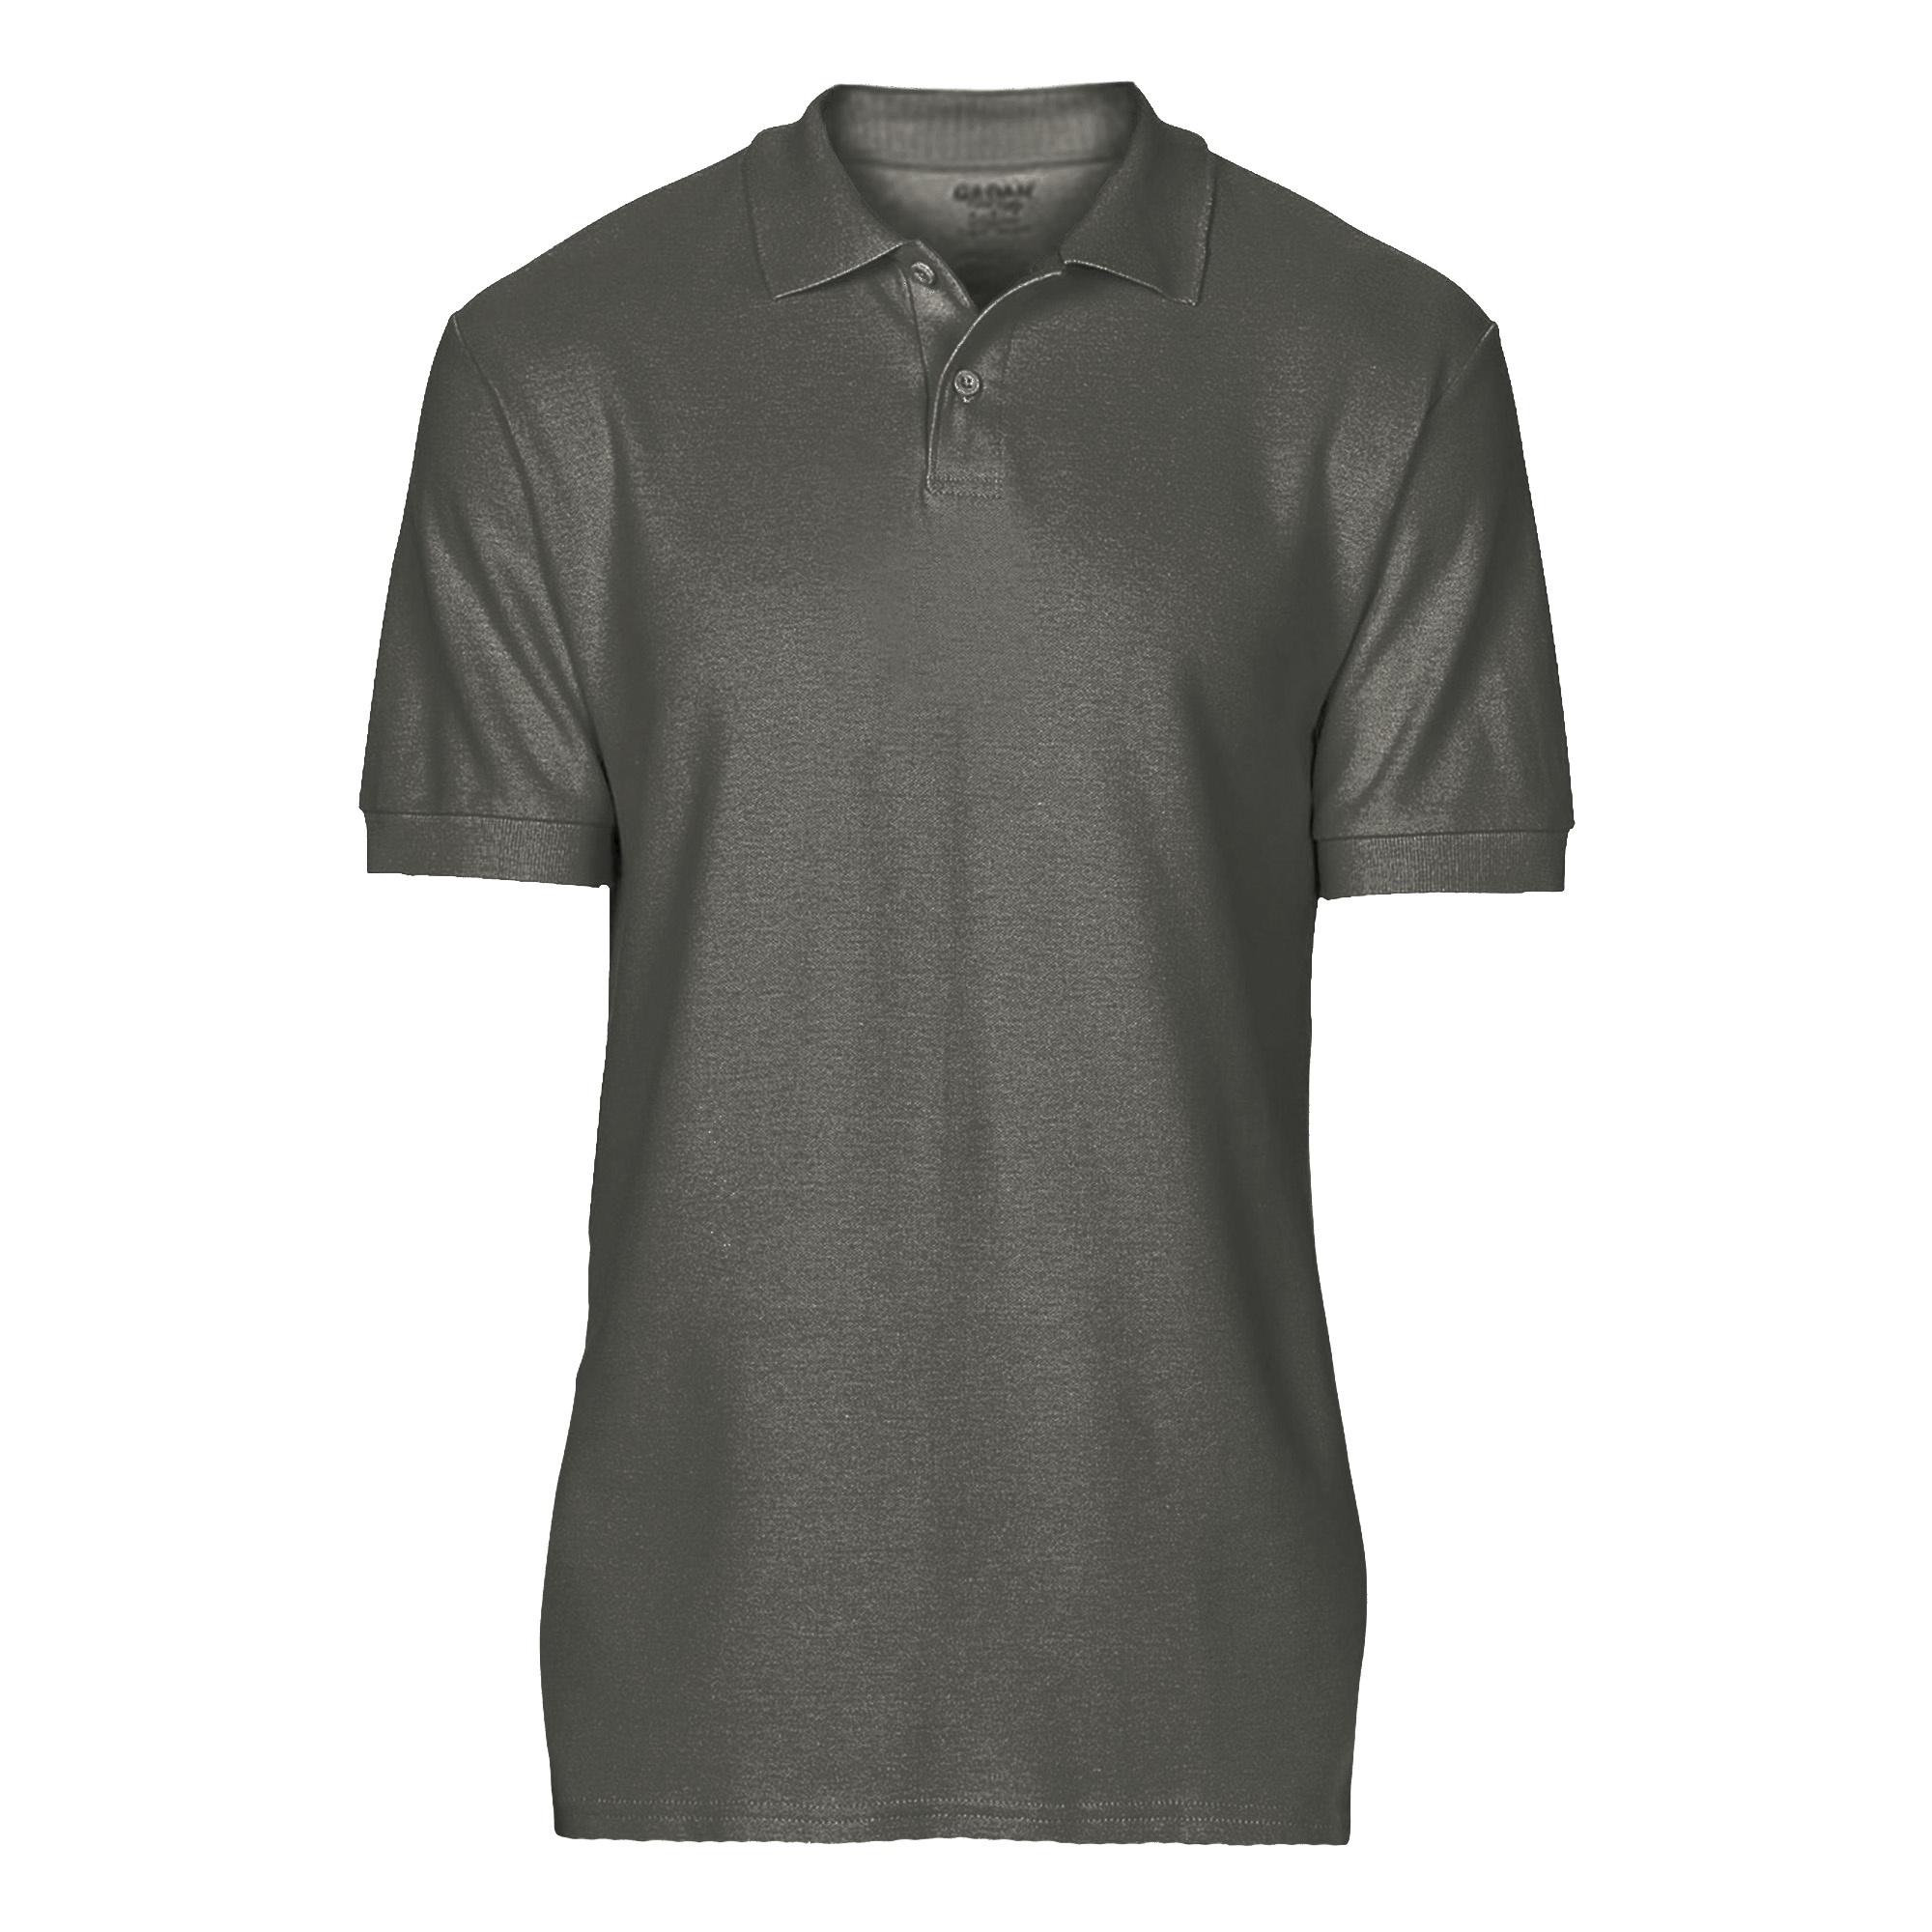 Gildan Softstyle Mens Short Sleeve Double Pique Polo Shirt (2XL) (Charcoal)